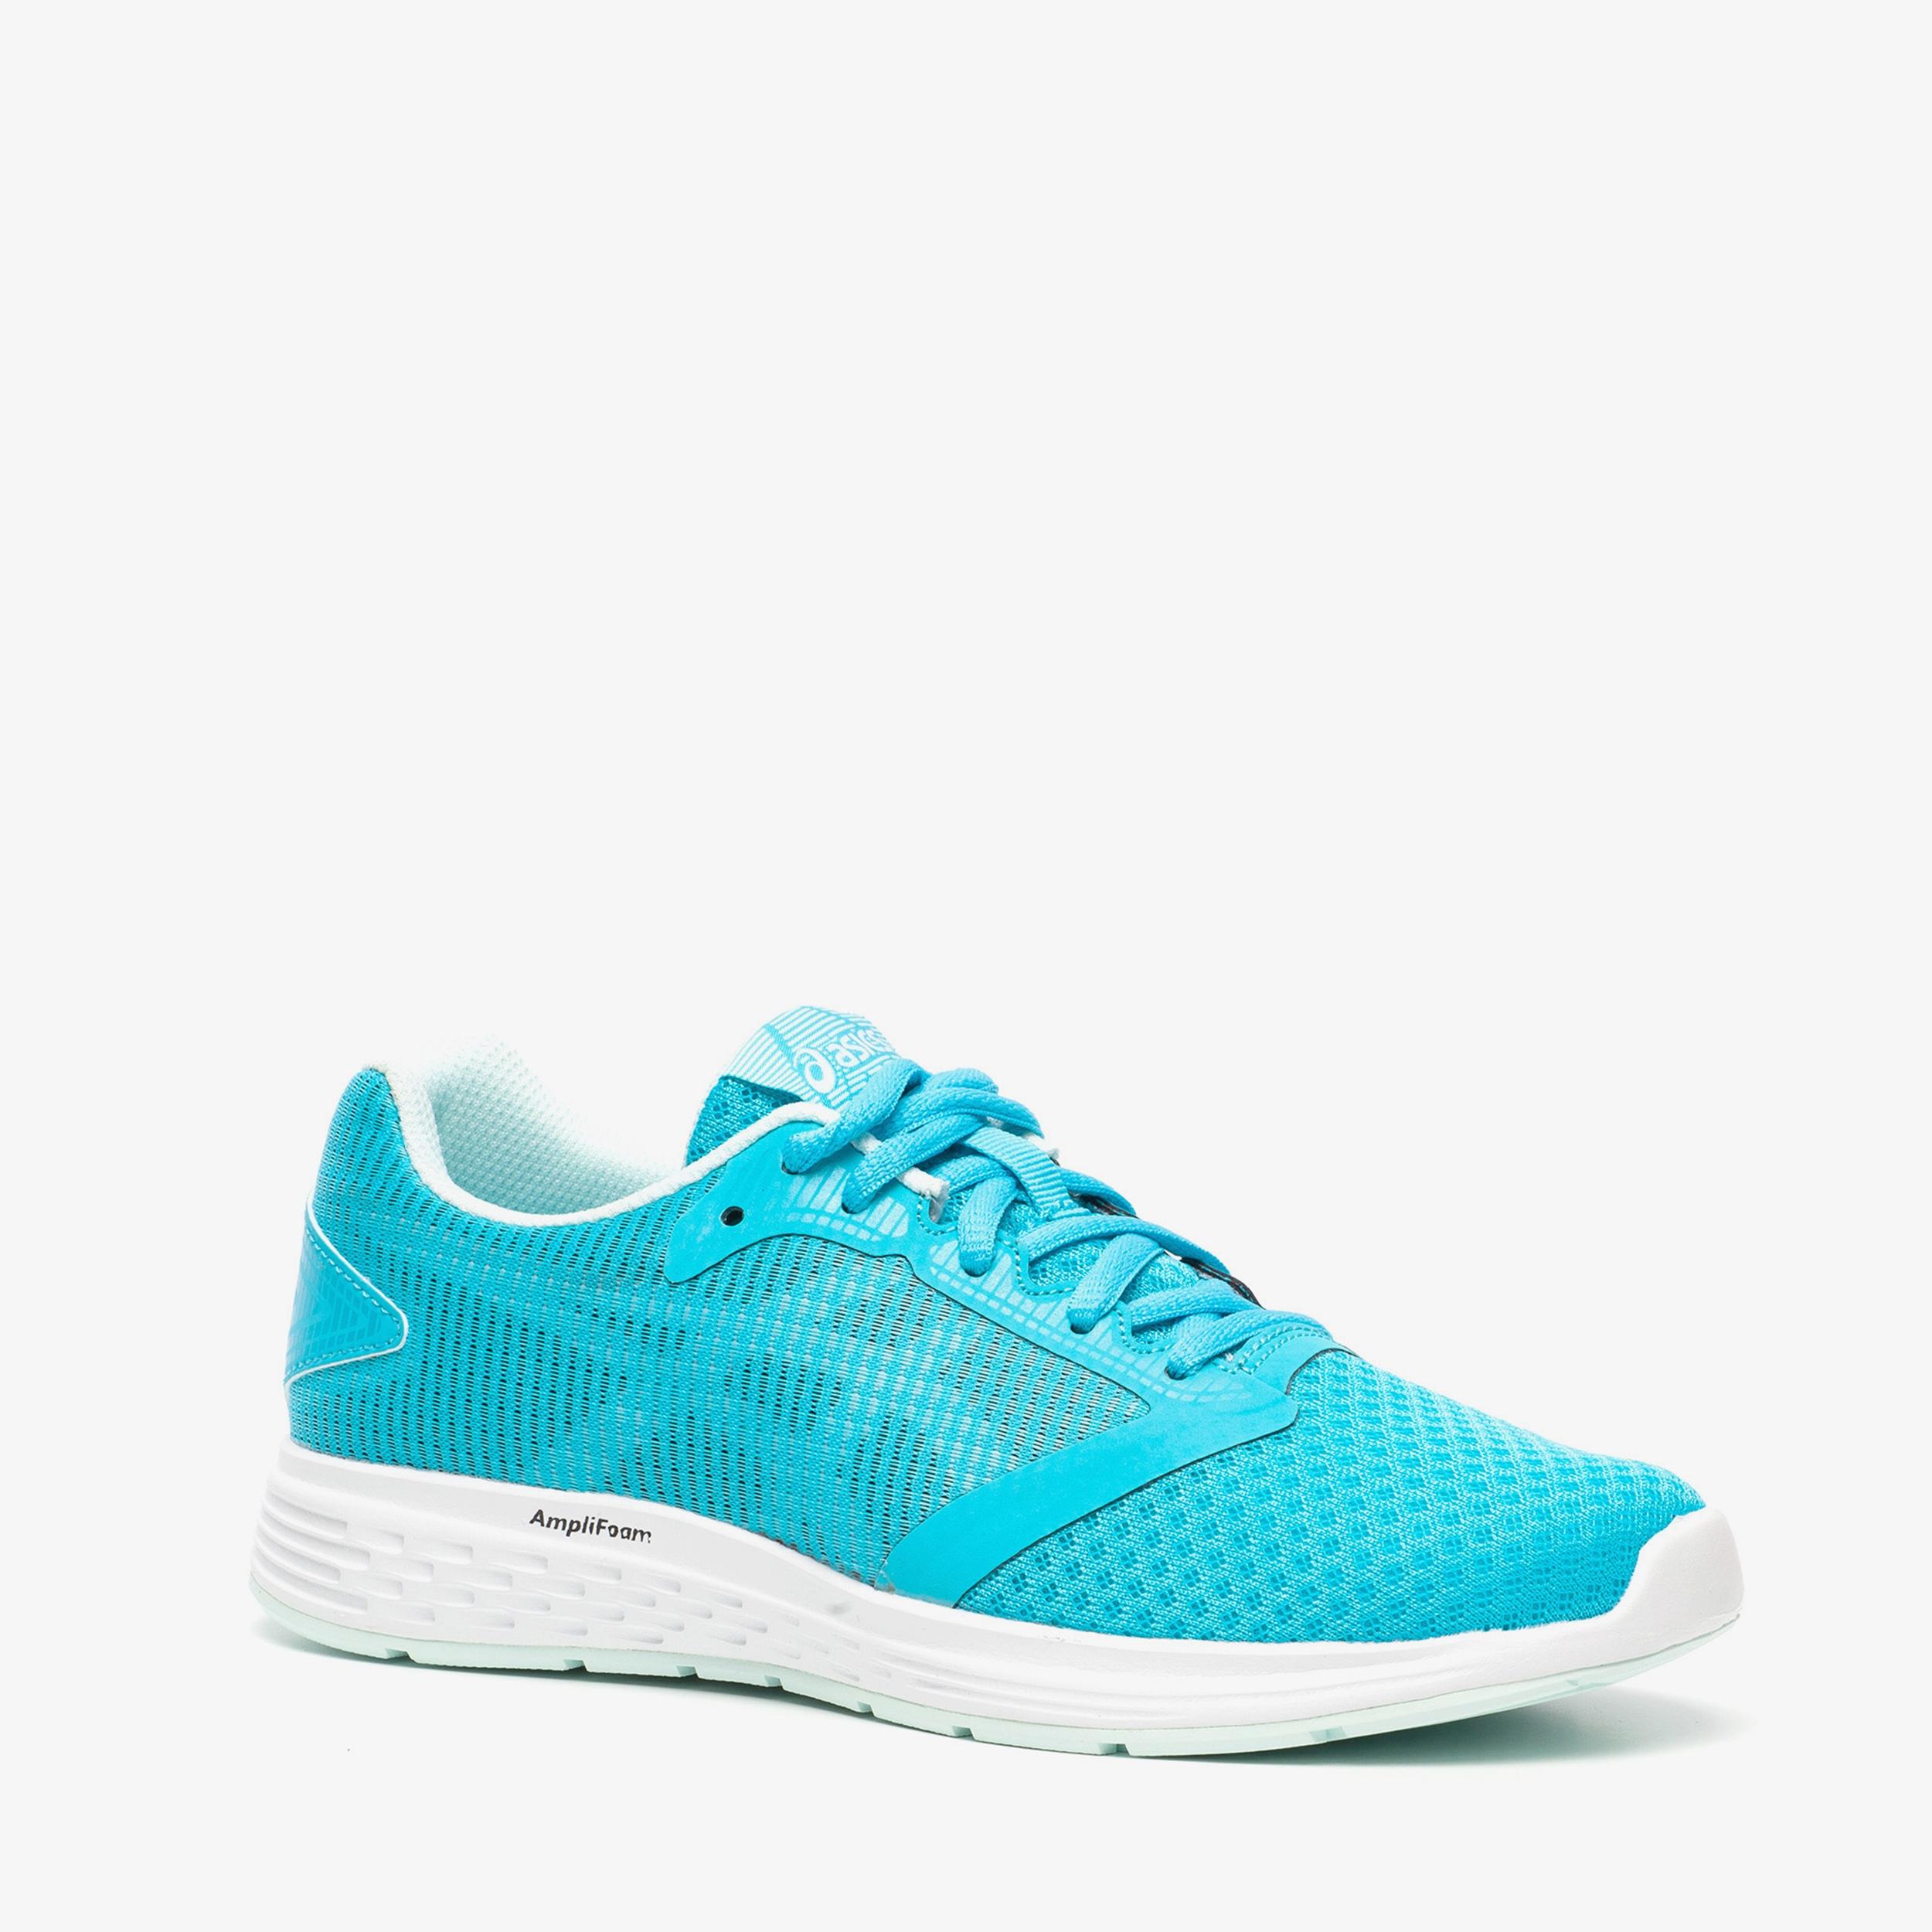 09da4621e83 Asics Patriot 10 dames hardloopschoenen online bestellen   Scapino